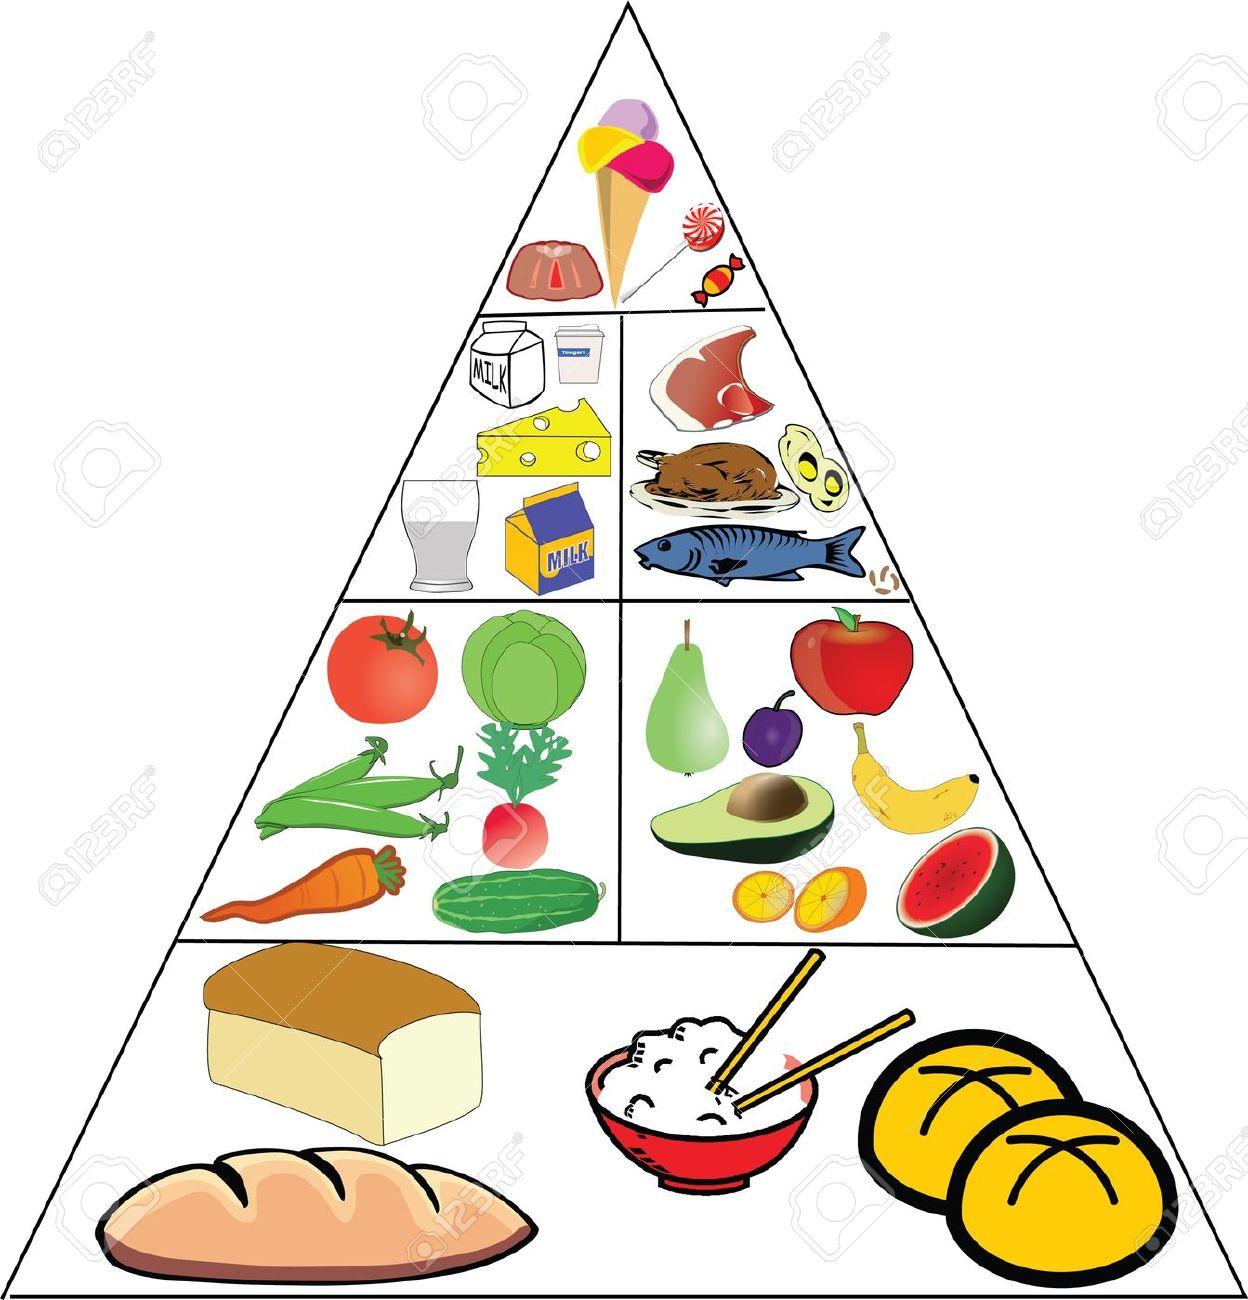 1248x1300 Free Clipart Food Pyramid